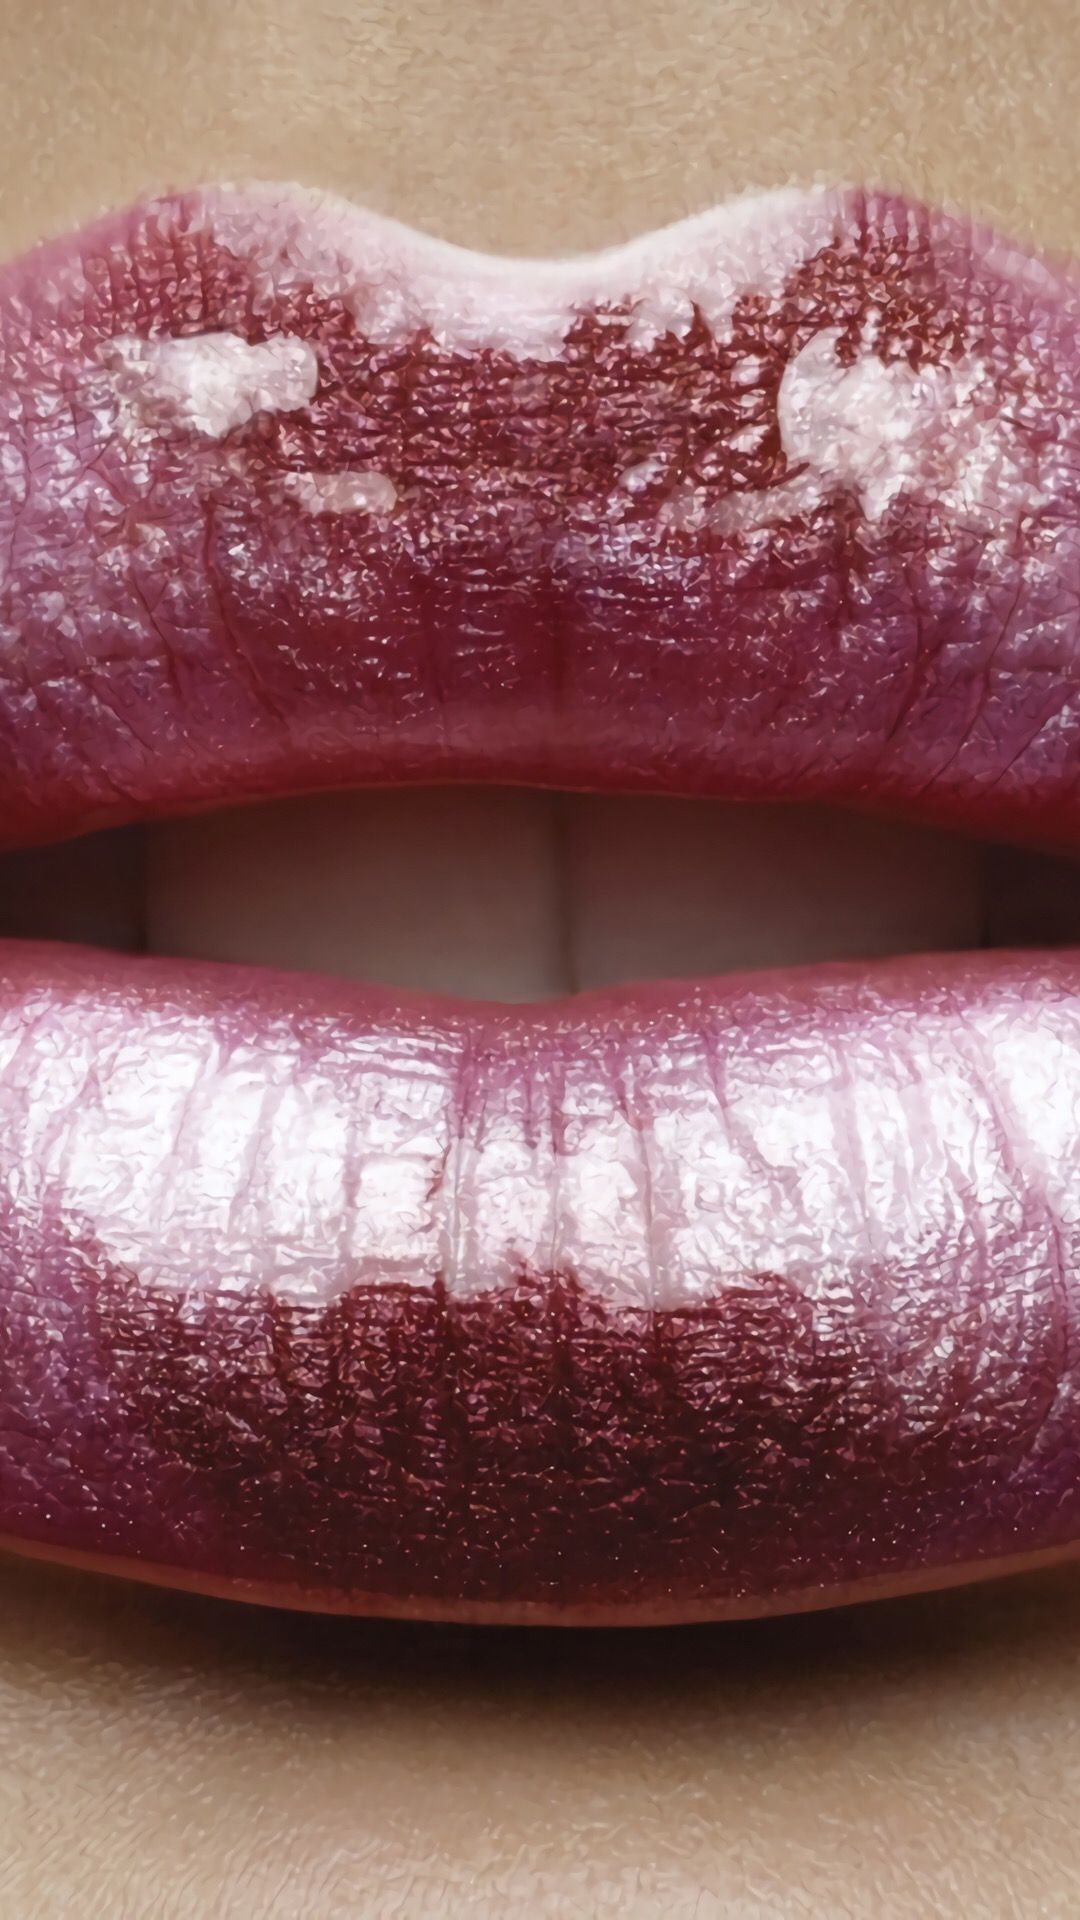 Meet NEW! Power Stay Lipstick #AVON #powerstay #lipstick #